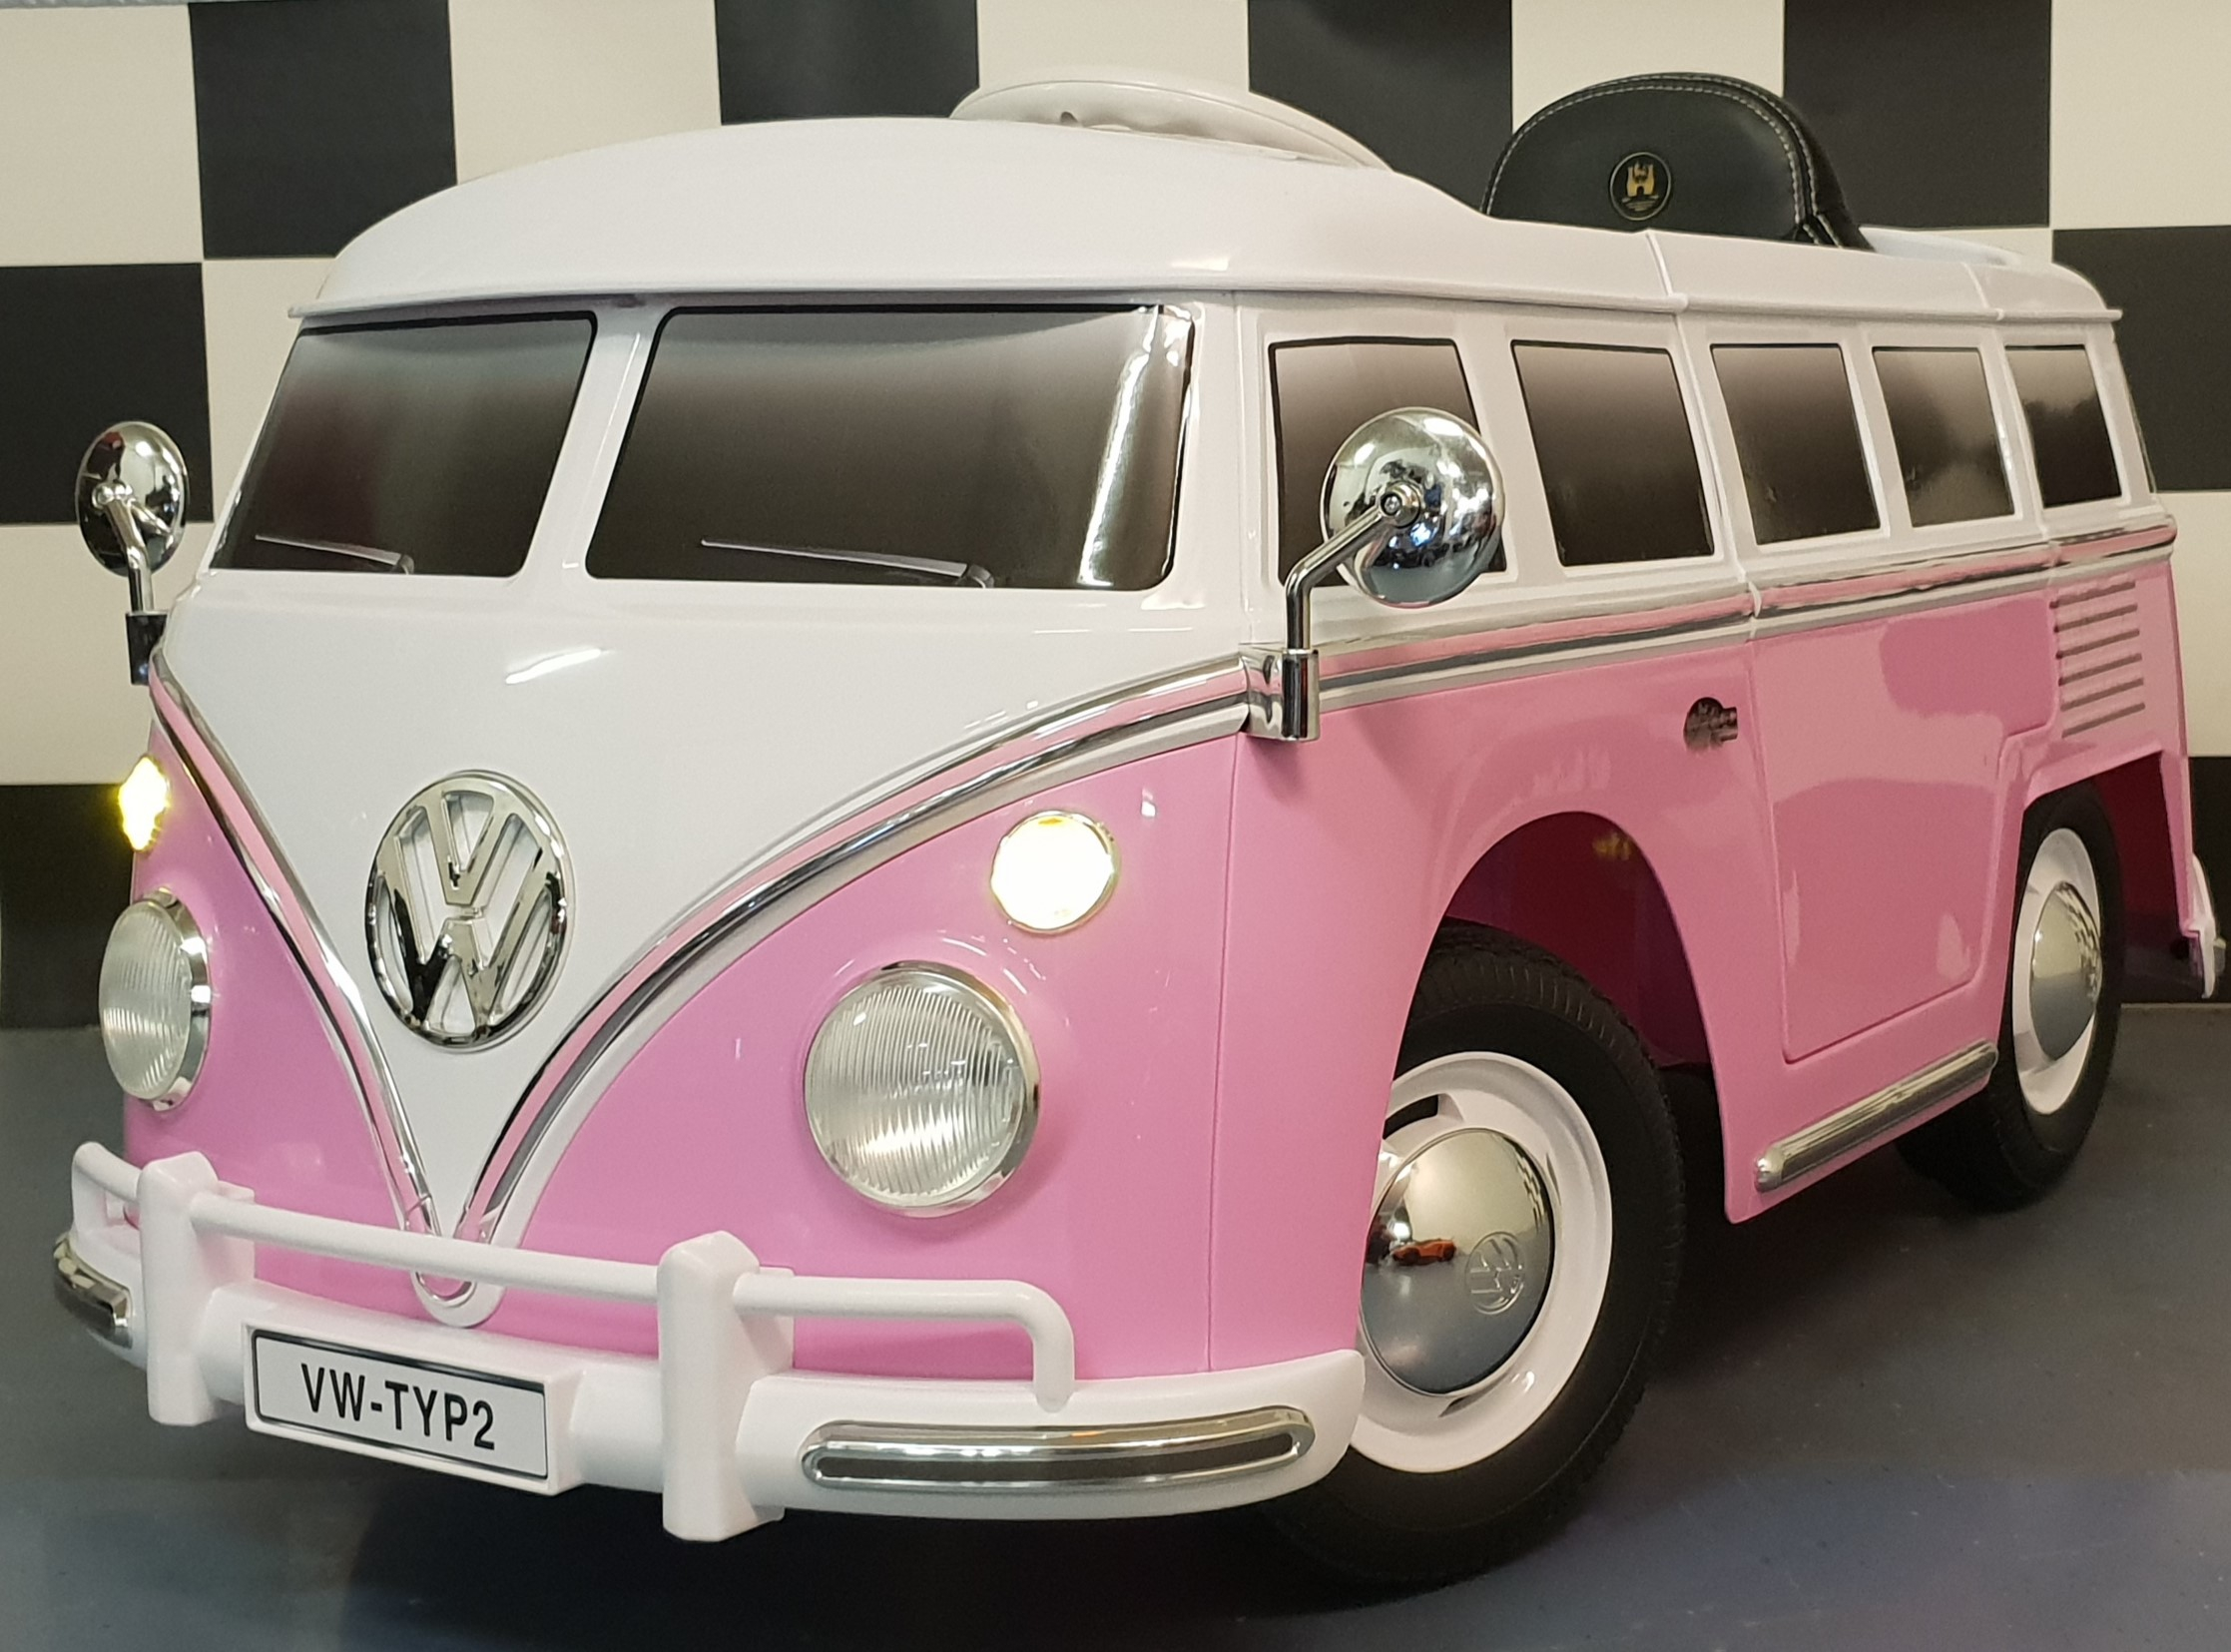 Volkswagen kinderauto T1 kinderbus 12V 2.4G RC roze